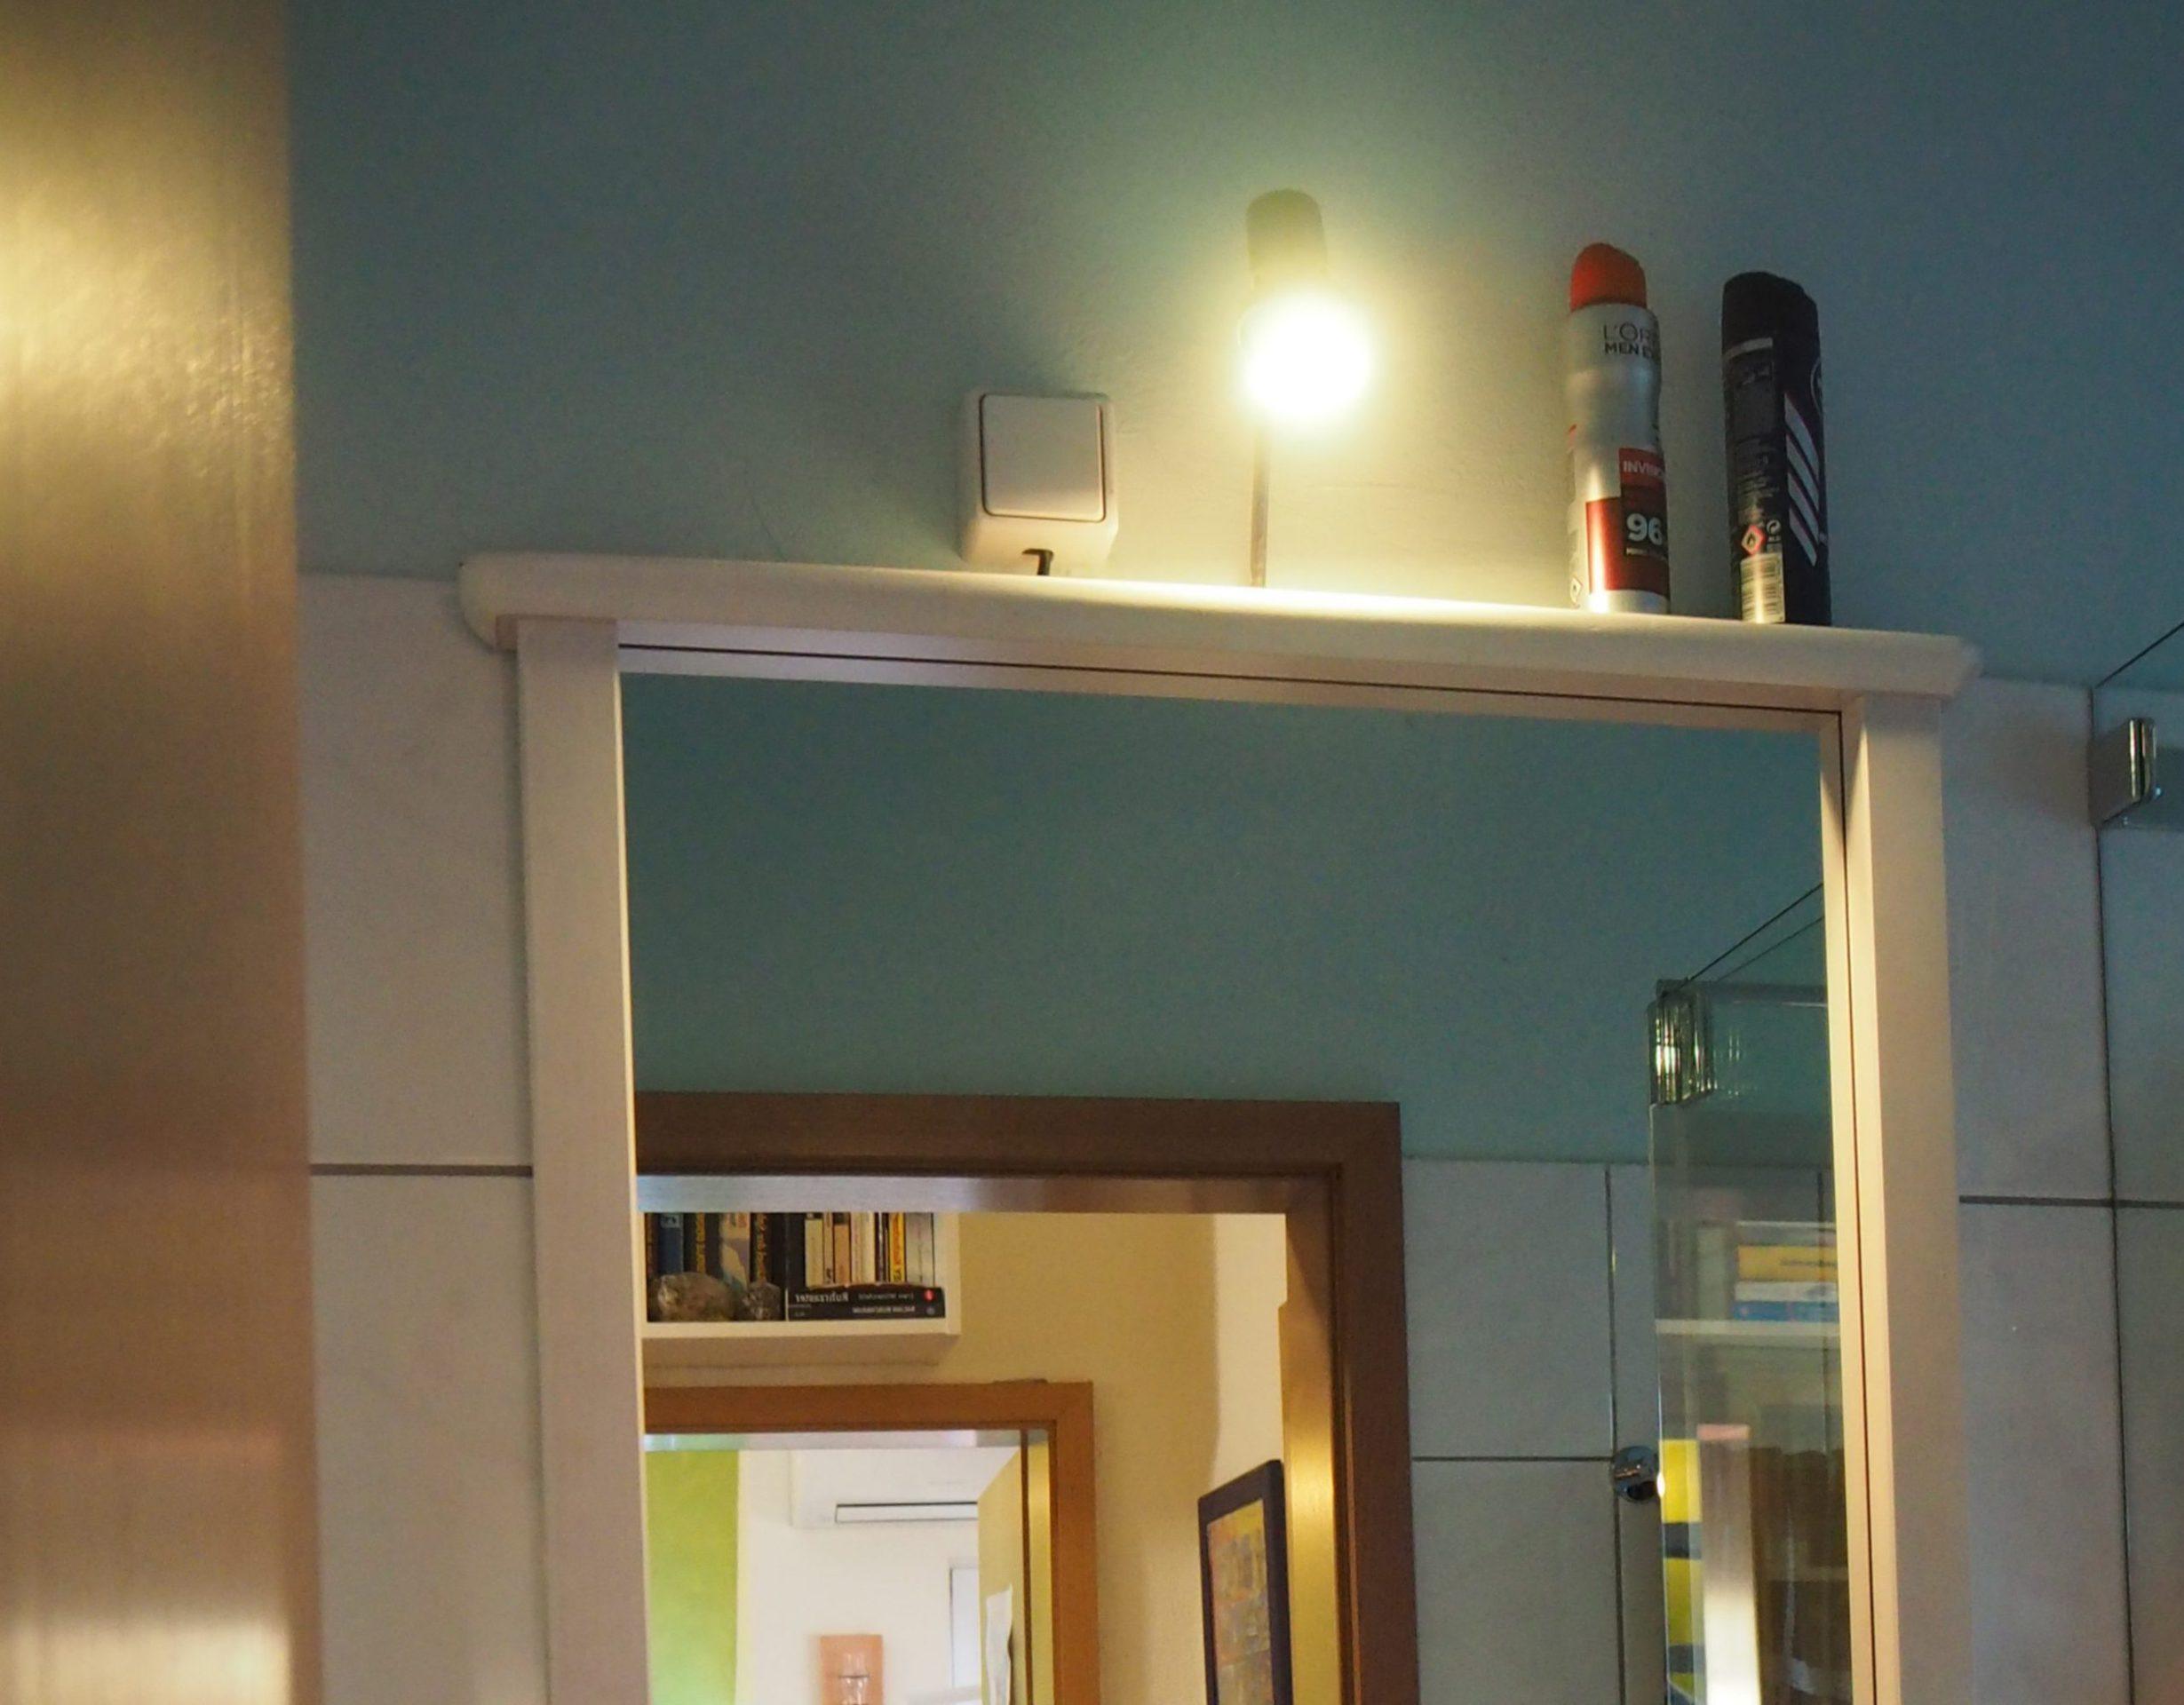 Lidl Smarthome Leuchtmittel im Bad, Test